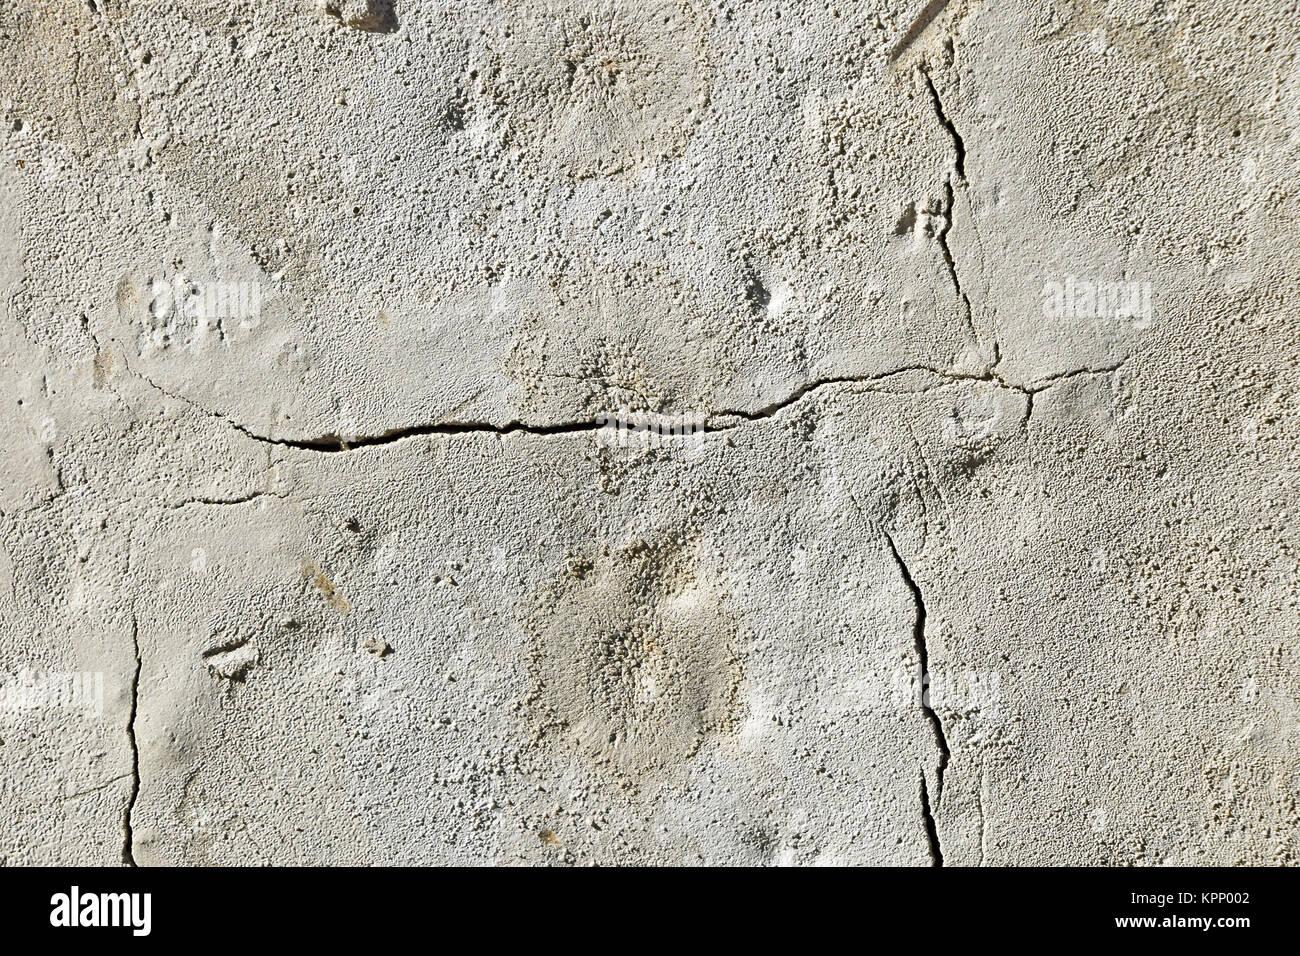 crack in concrete stockfotos crack in concrete bilder alamy. Black Bedroom Furniture Sets. Home Design Ideas